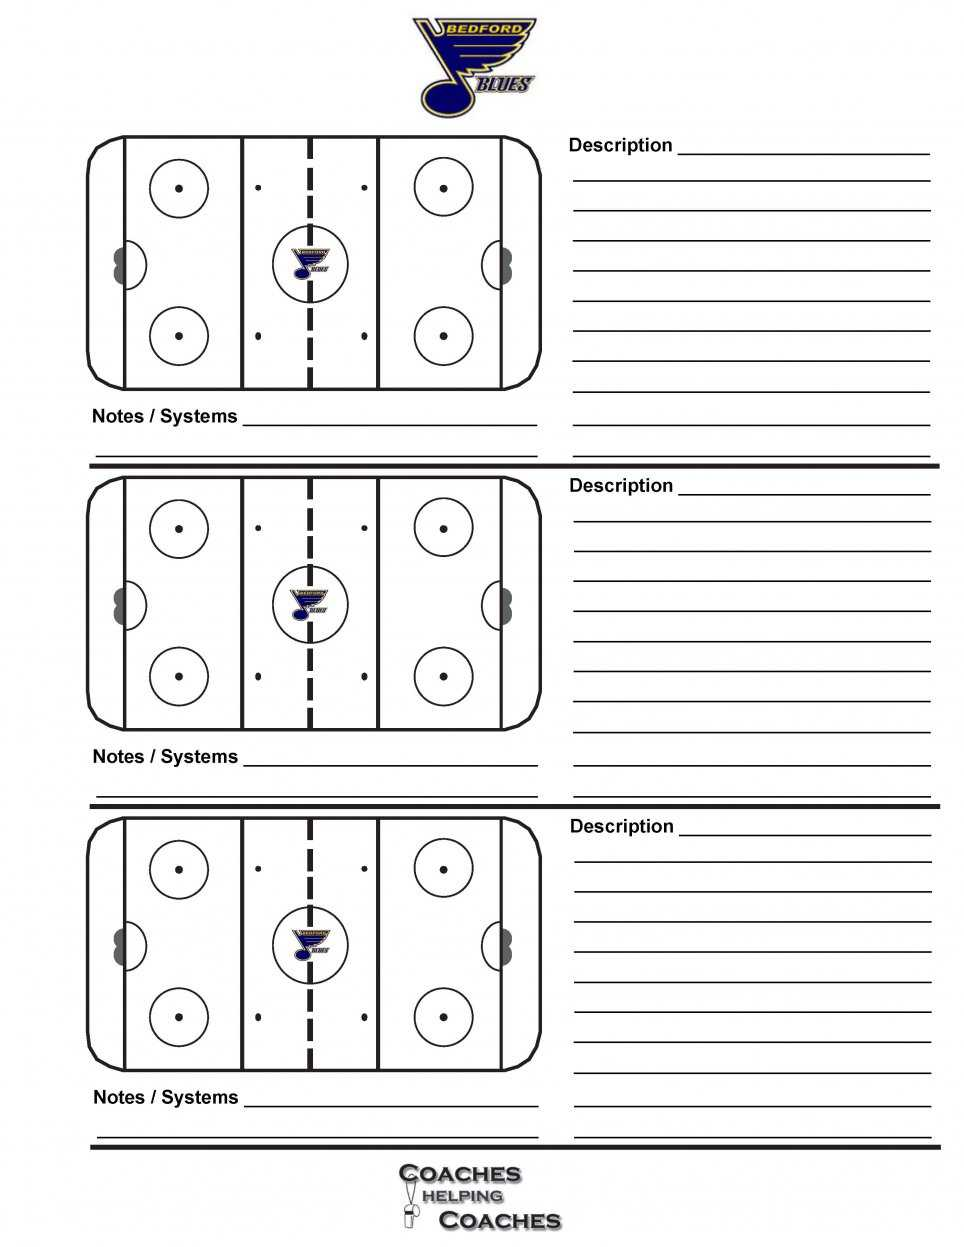 Bedford Minor Hockey Association Hockey Poweredgoalline.ca Pertaining To Blank Hockey Practice Plan Template